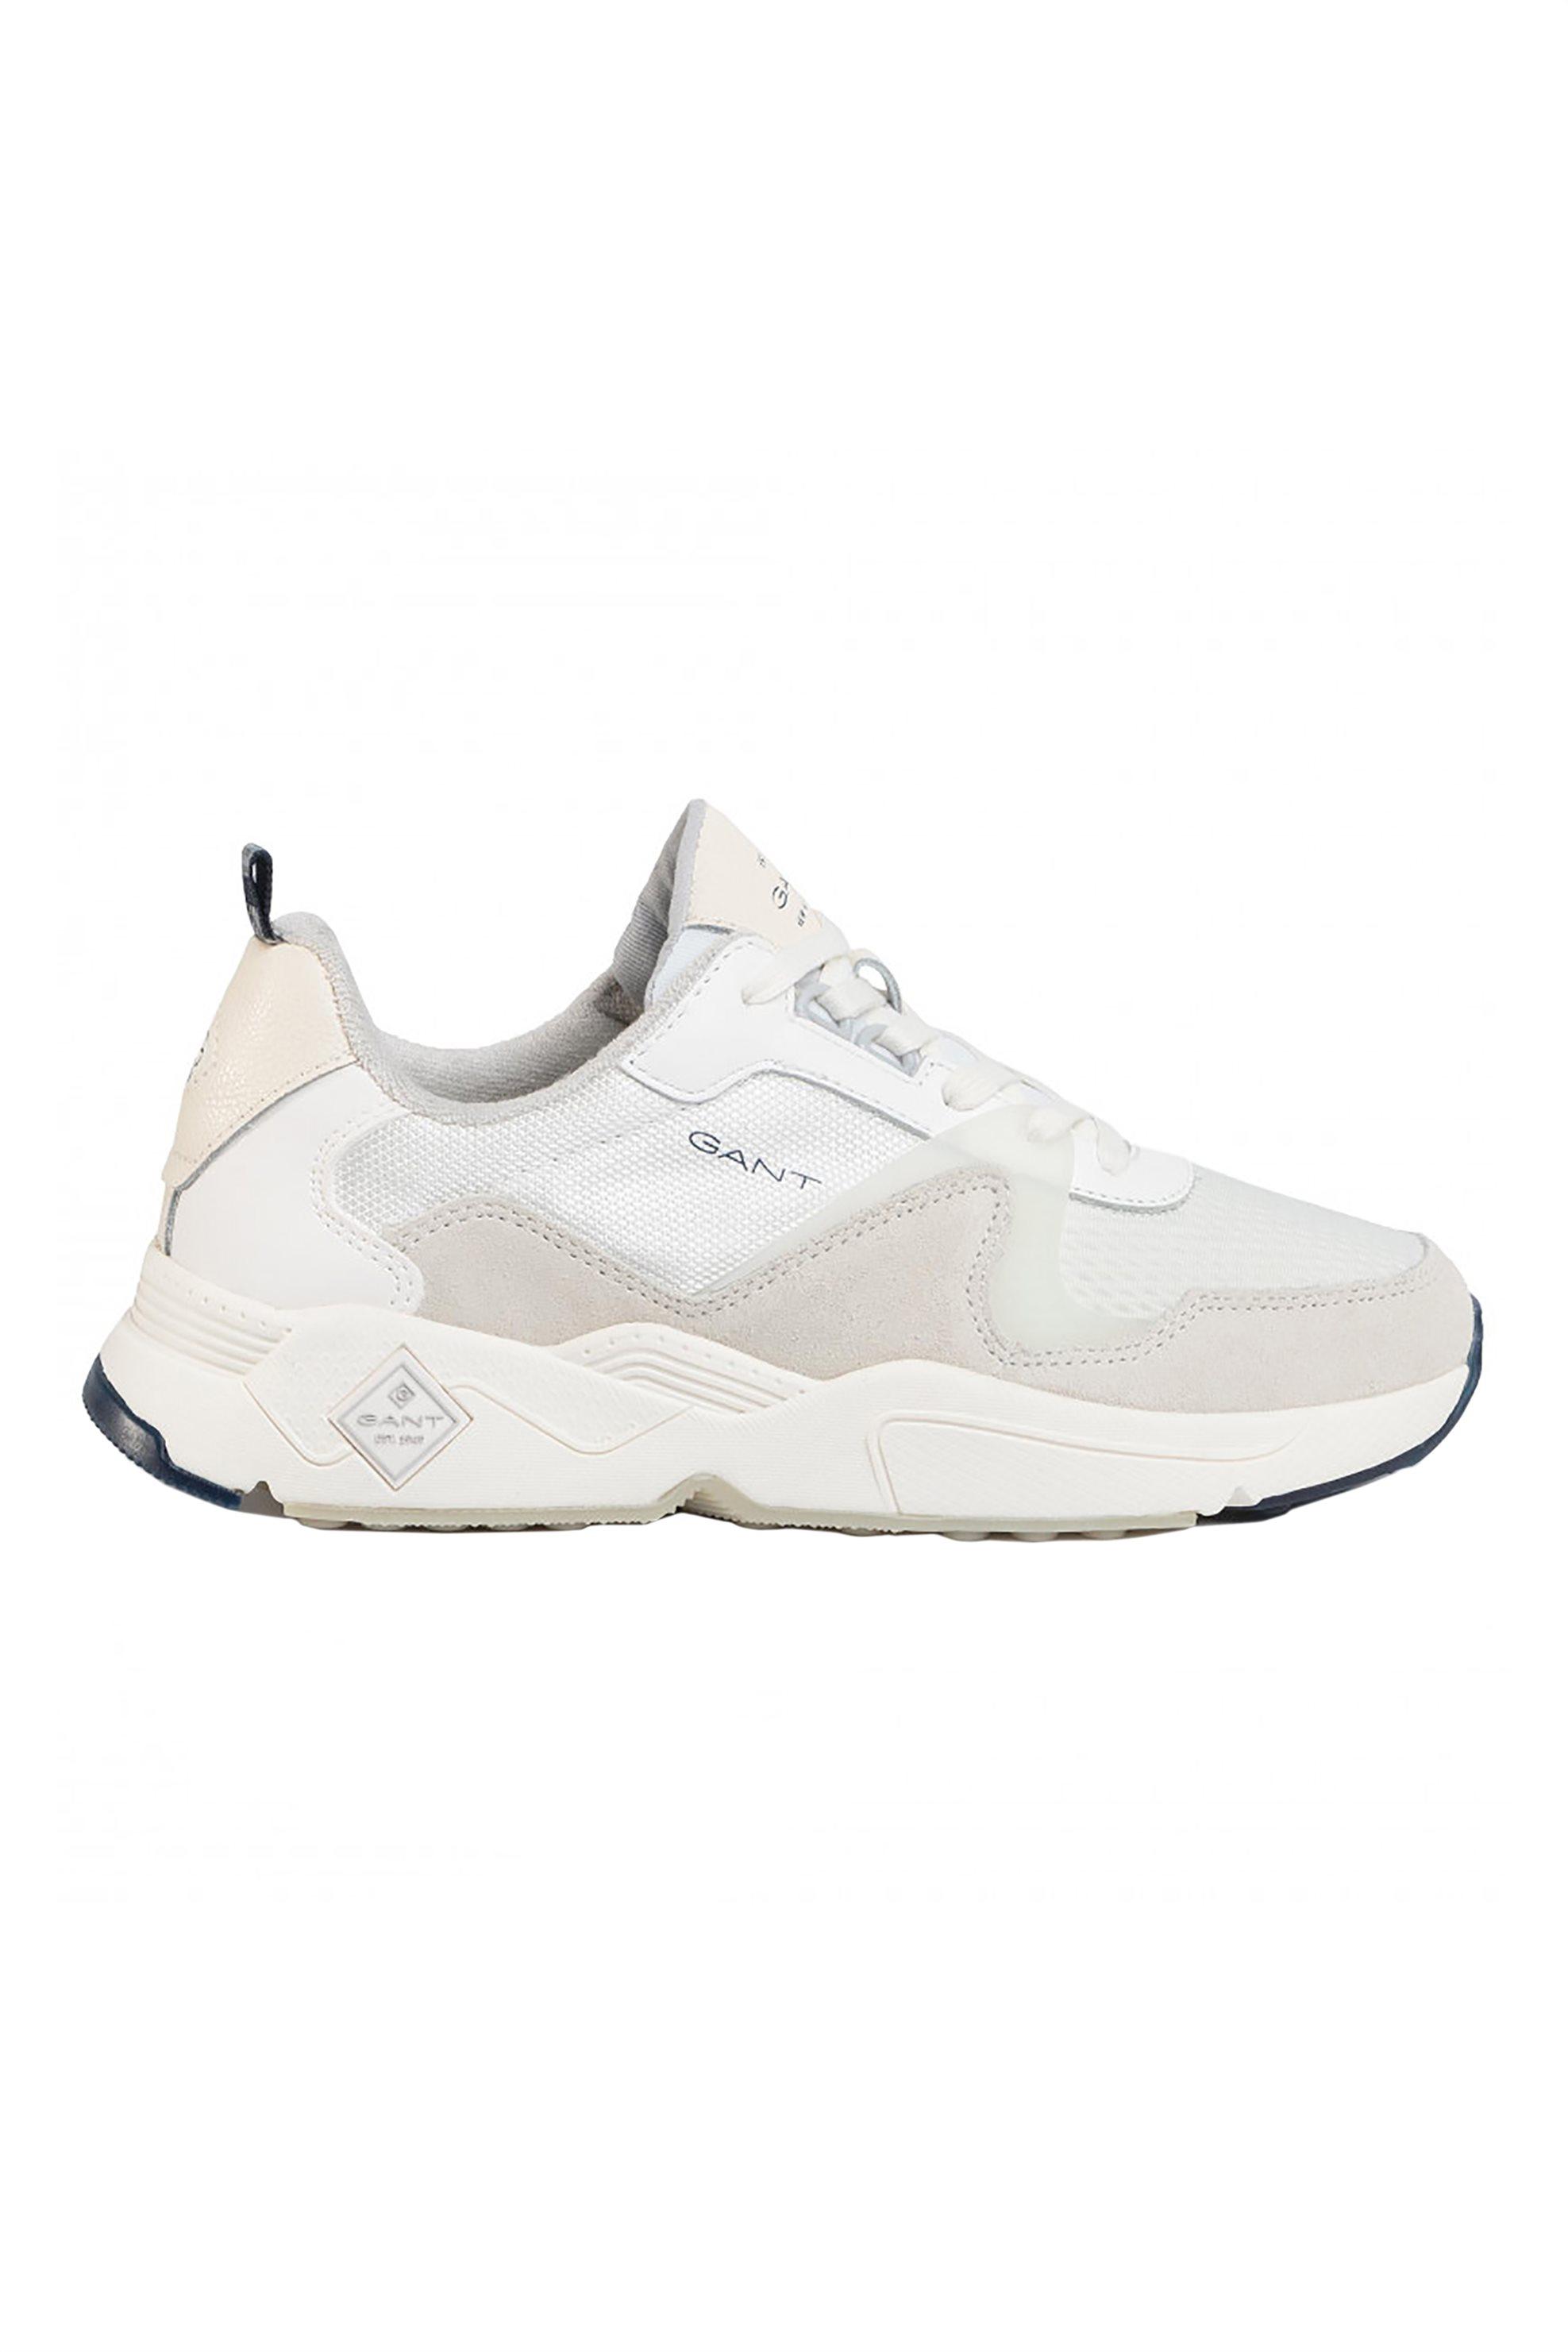 Gant ανδρικά sneakers με suede λεπτομέρειες – 20639531 – Εκρού